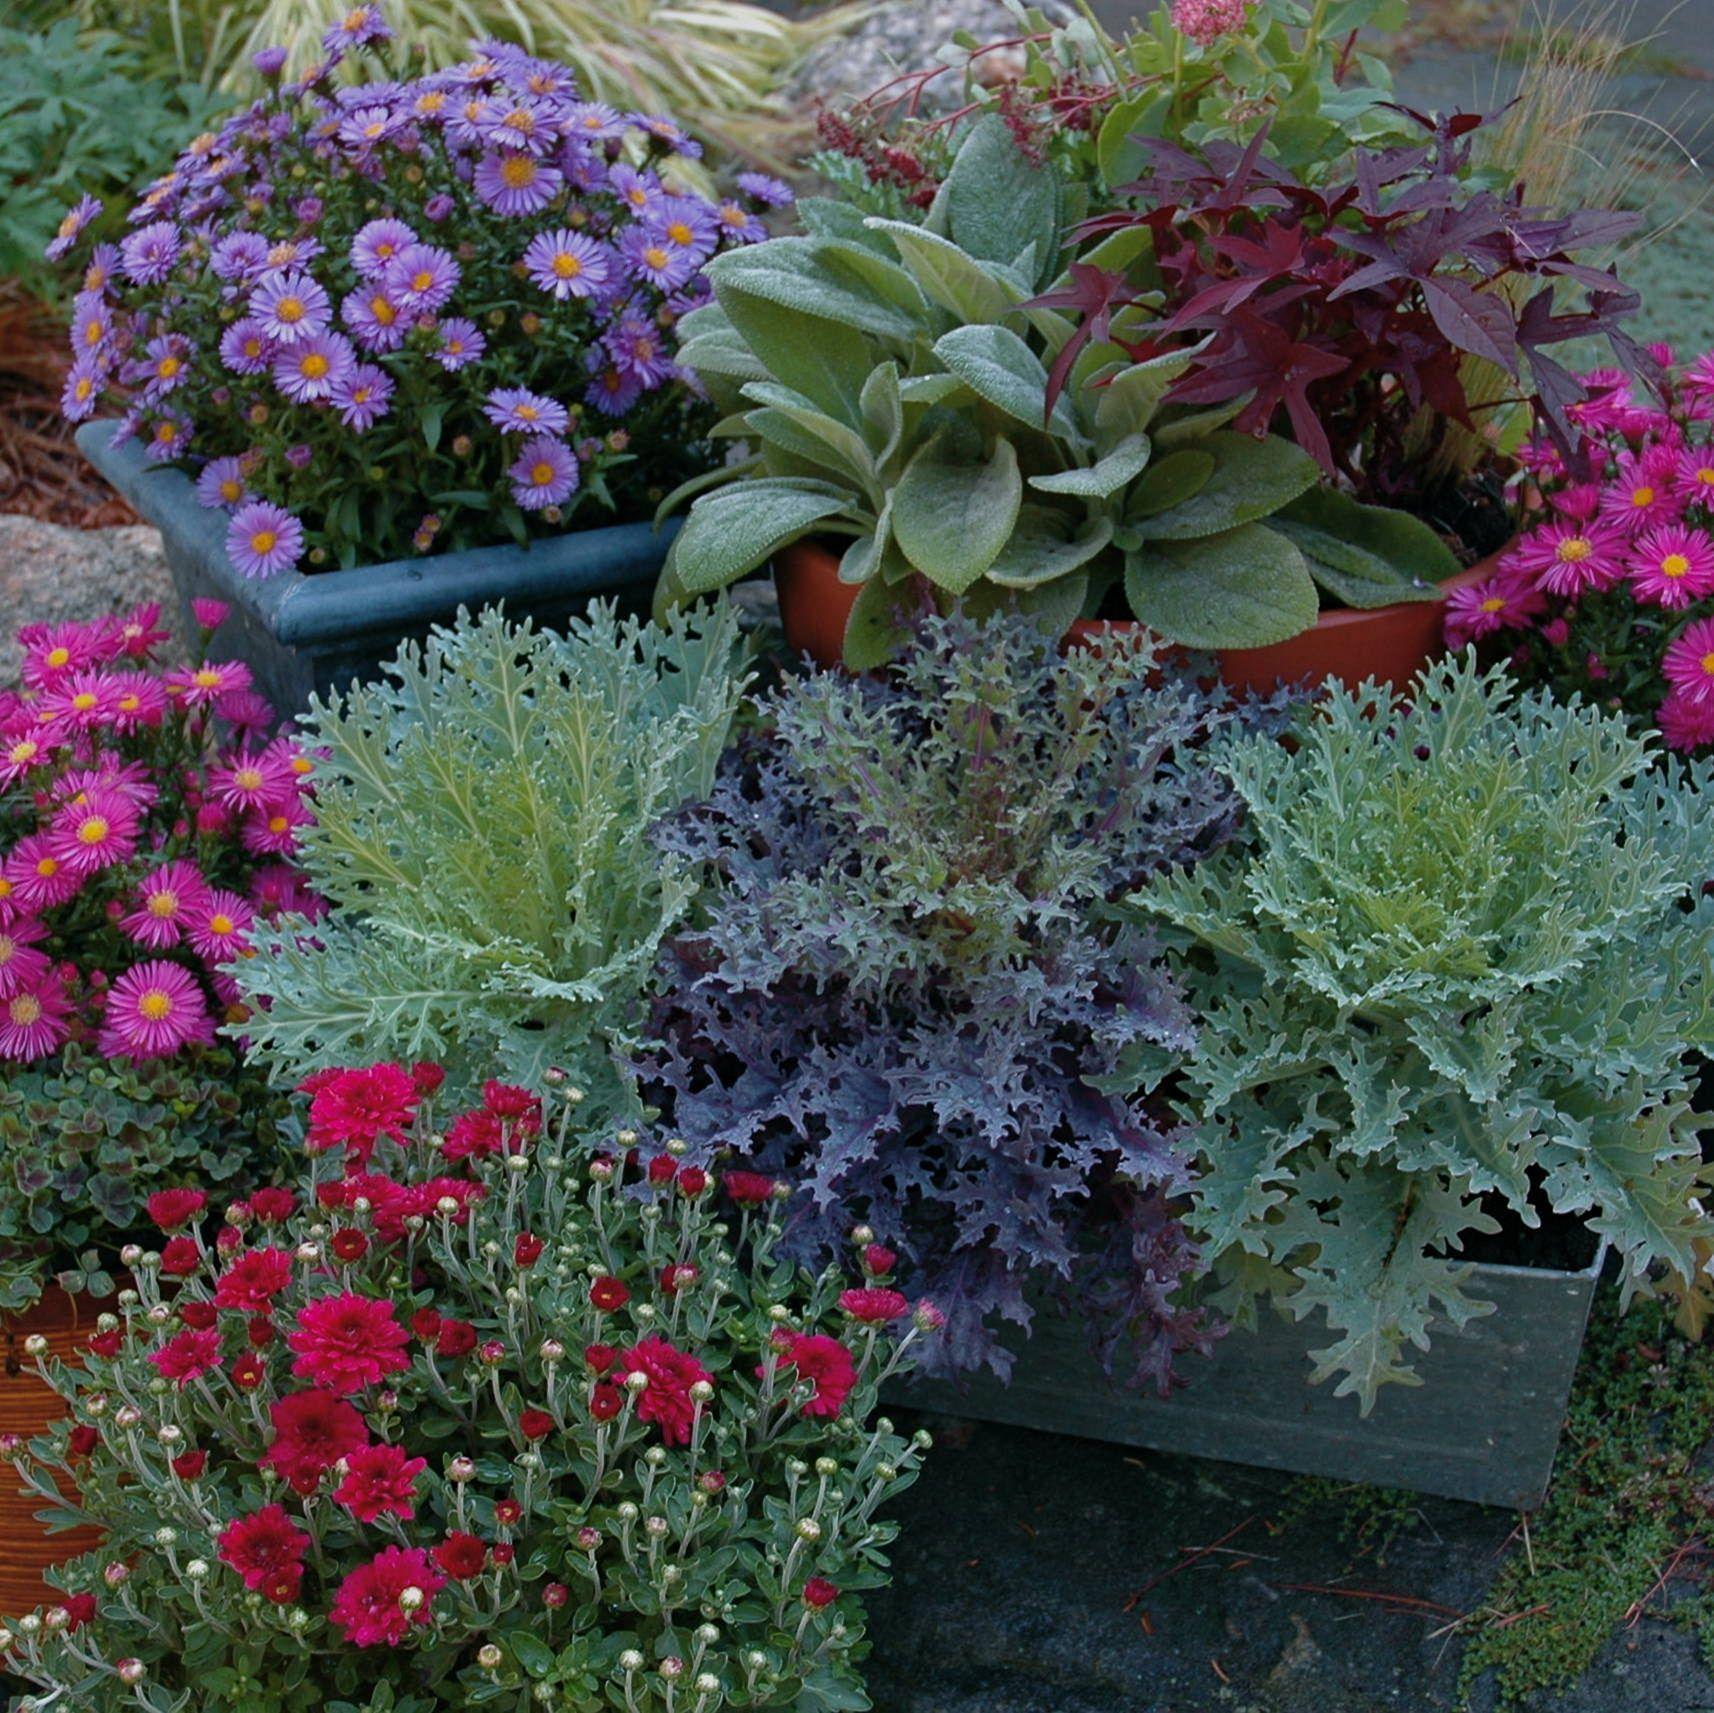 10 Creative Vegetable Garden Ideas: 10 Amazing Creative Gardens Containers Ideas For Beautiful